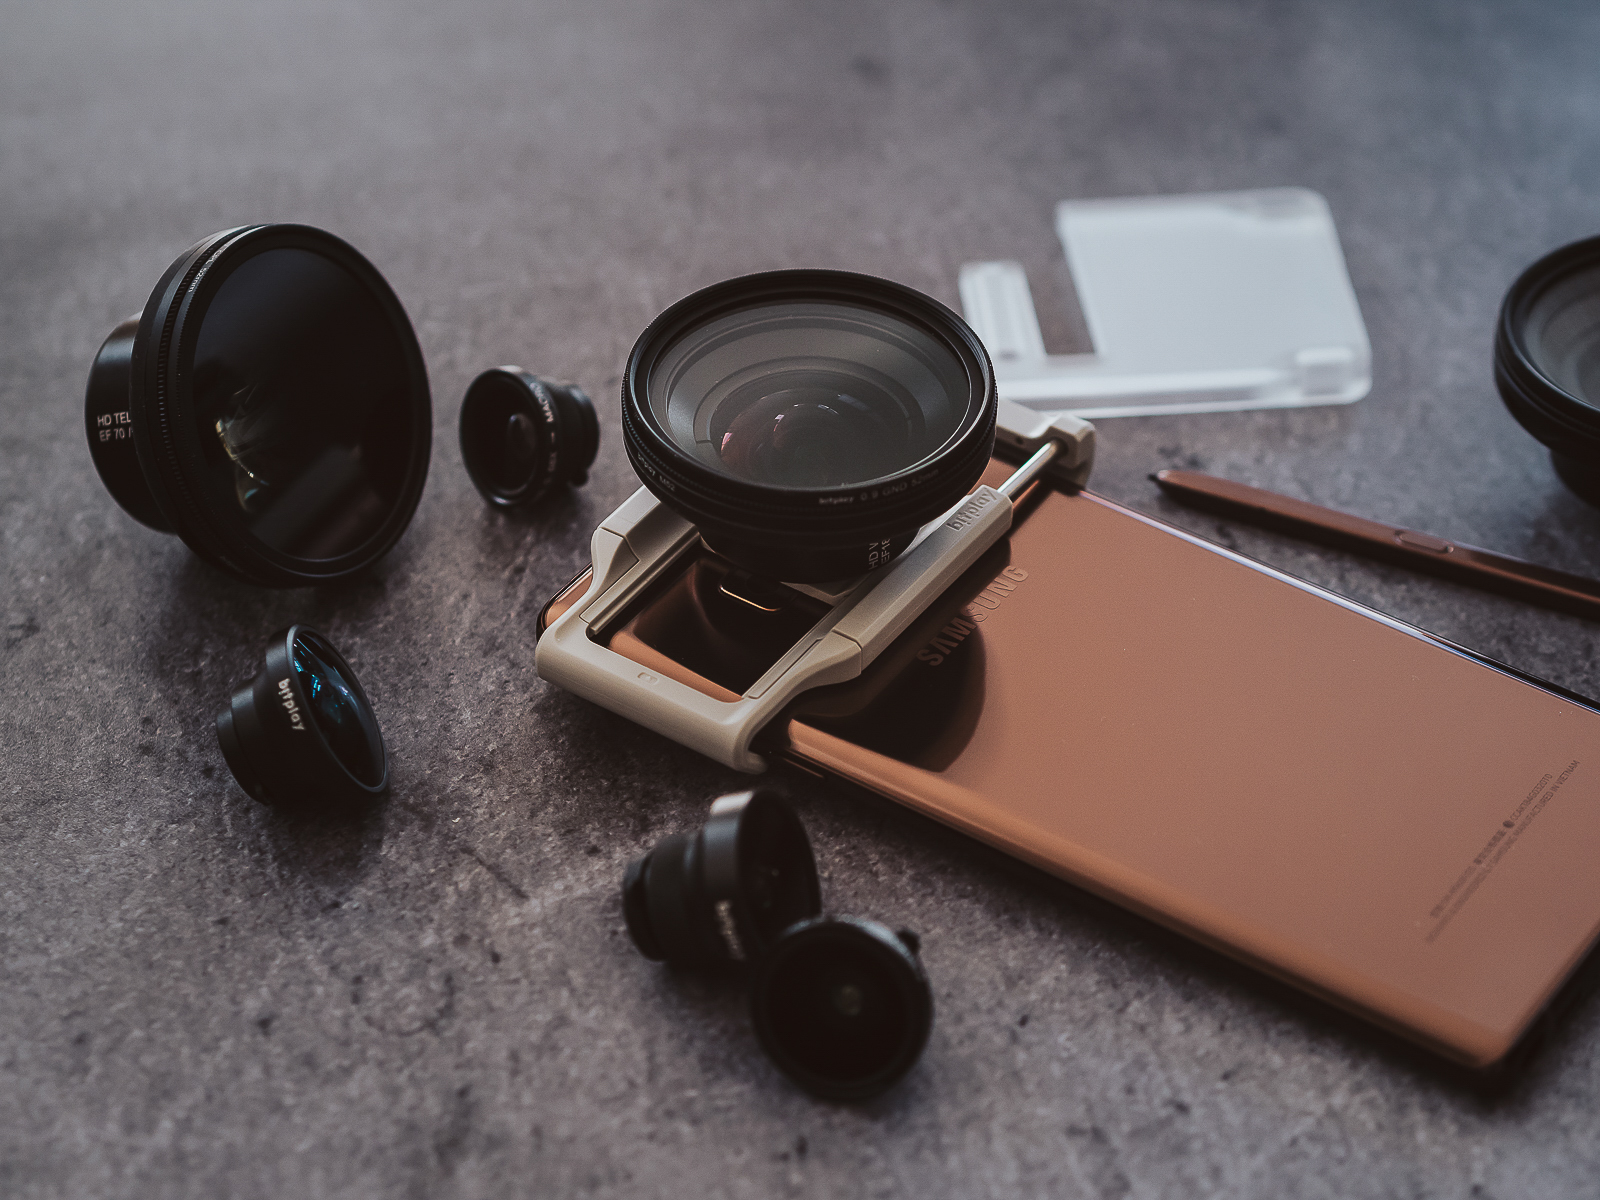 bitplay AllClip & iPhoneX + Samsung Galaxy Note9 - Olympus EM1Markii4518 - Yes! Please Enjoy-15.jpg